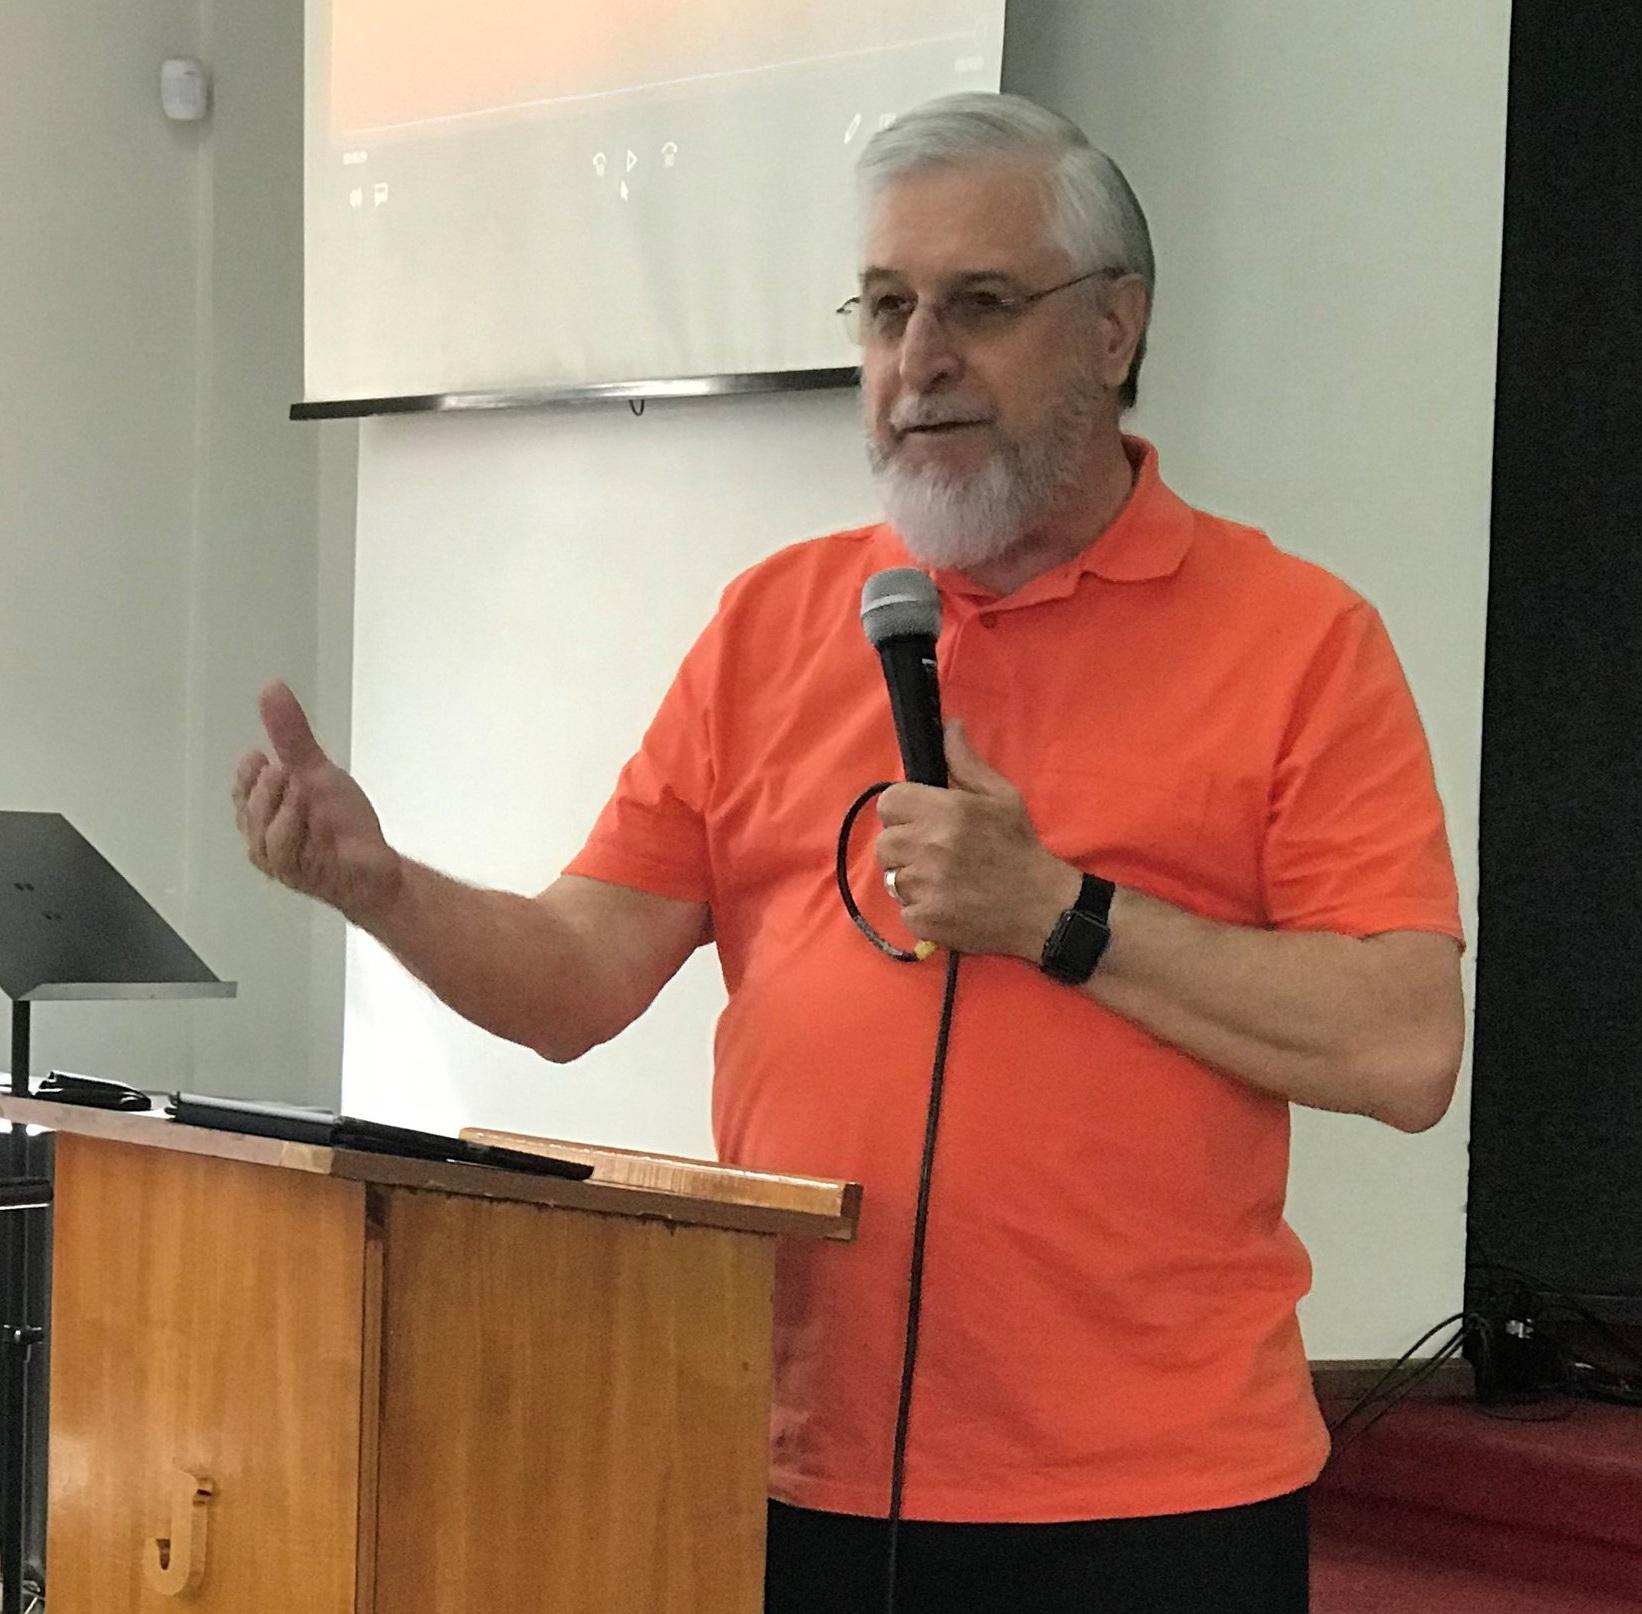 Pezini+March+2019+update+teaching.jpg